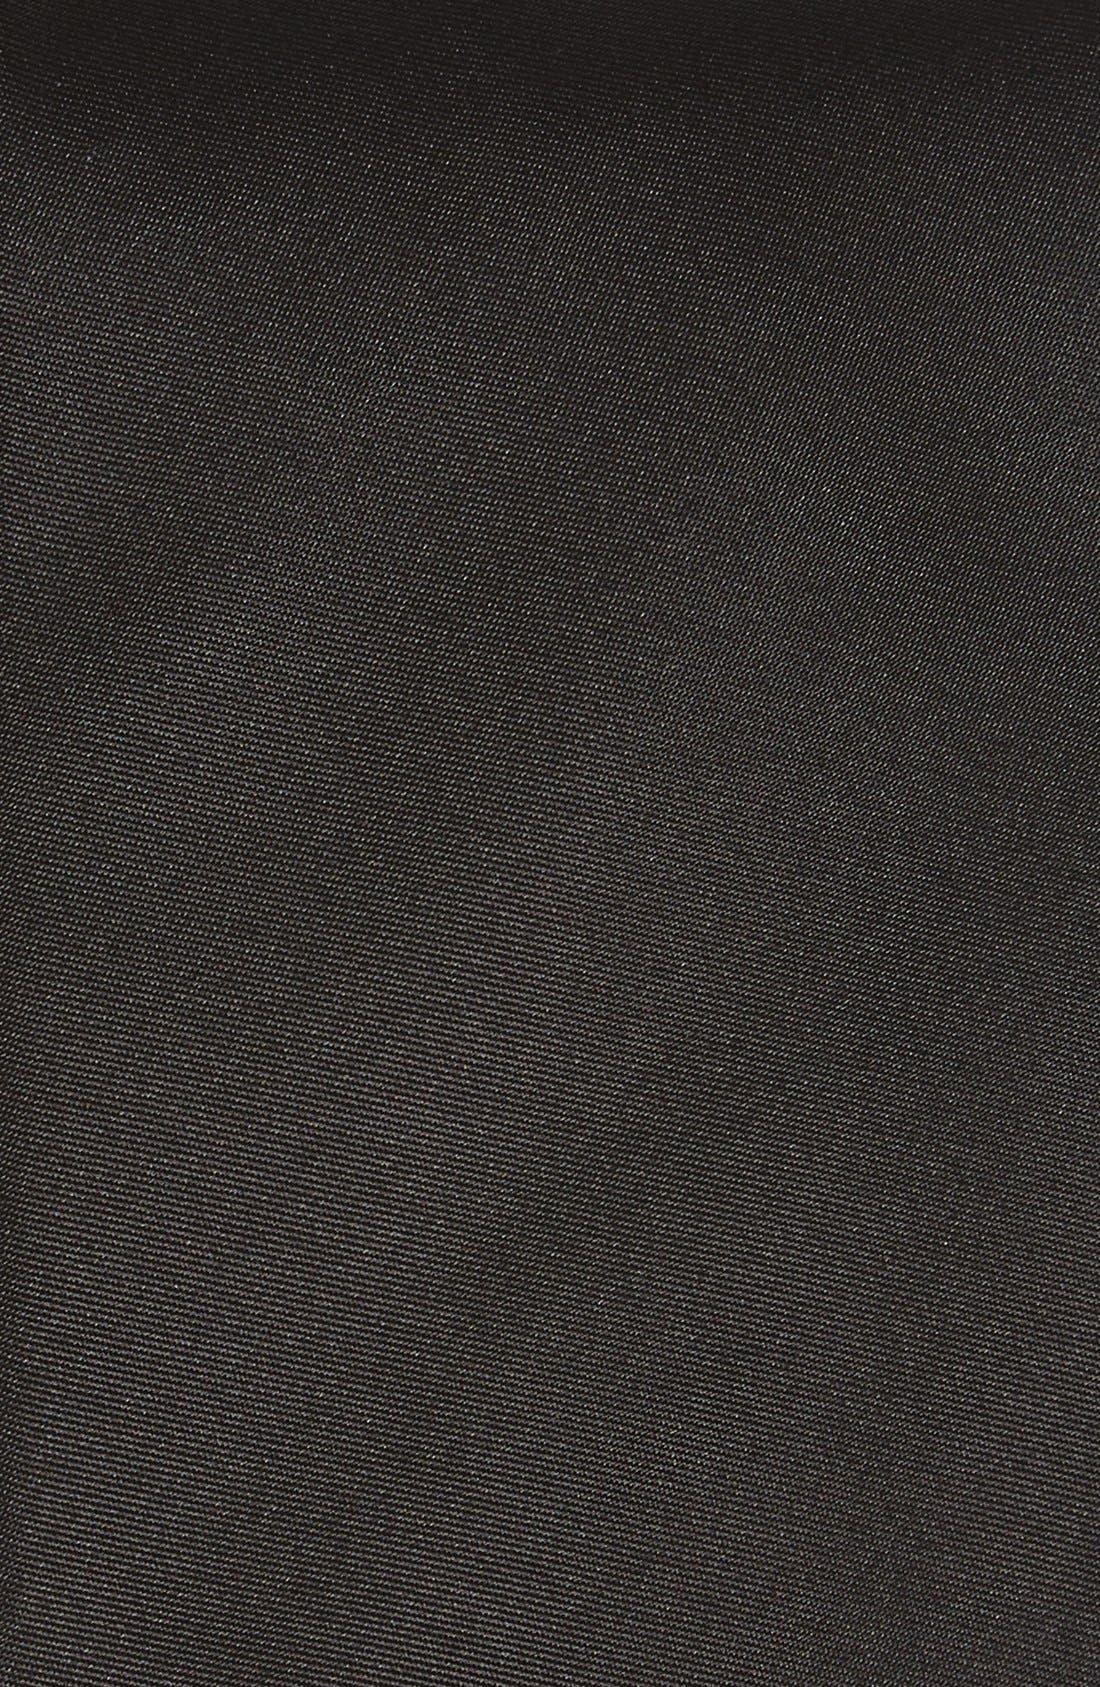 Solid Silk Skinny Tie,                             Alternate thumbnail 2, color,                             Black